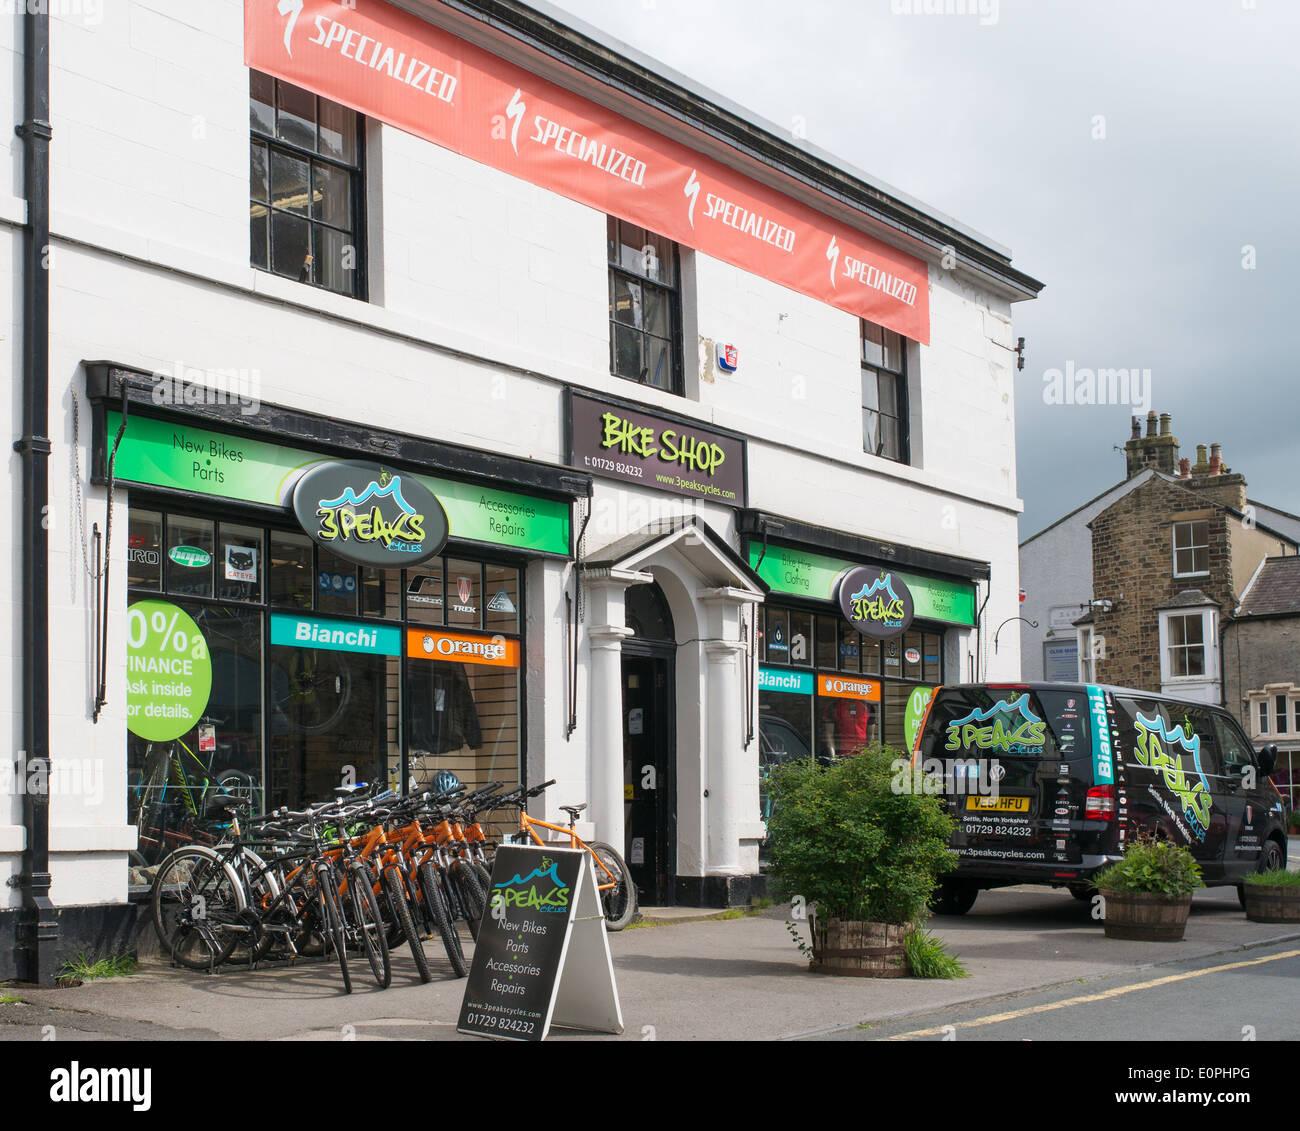 3 Peaks Bike Shop Settle, north Yorkshire, England, UK Stock Photo